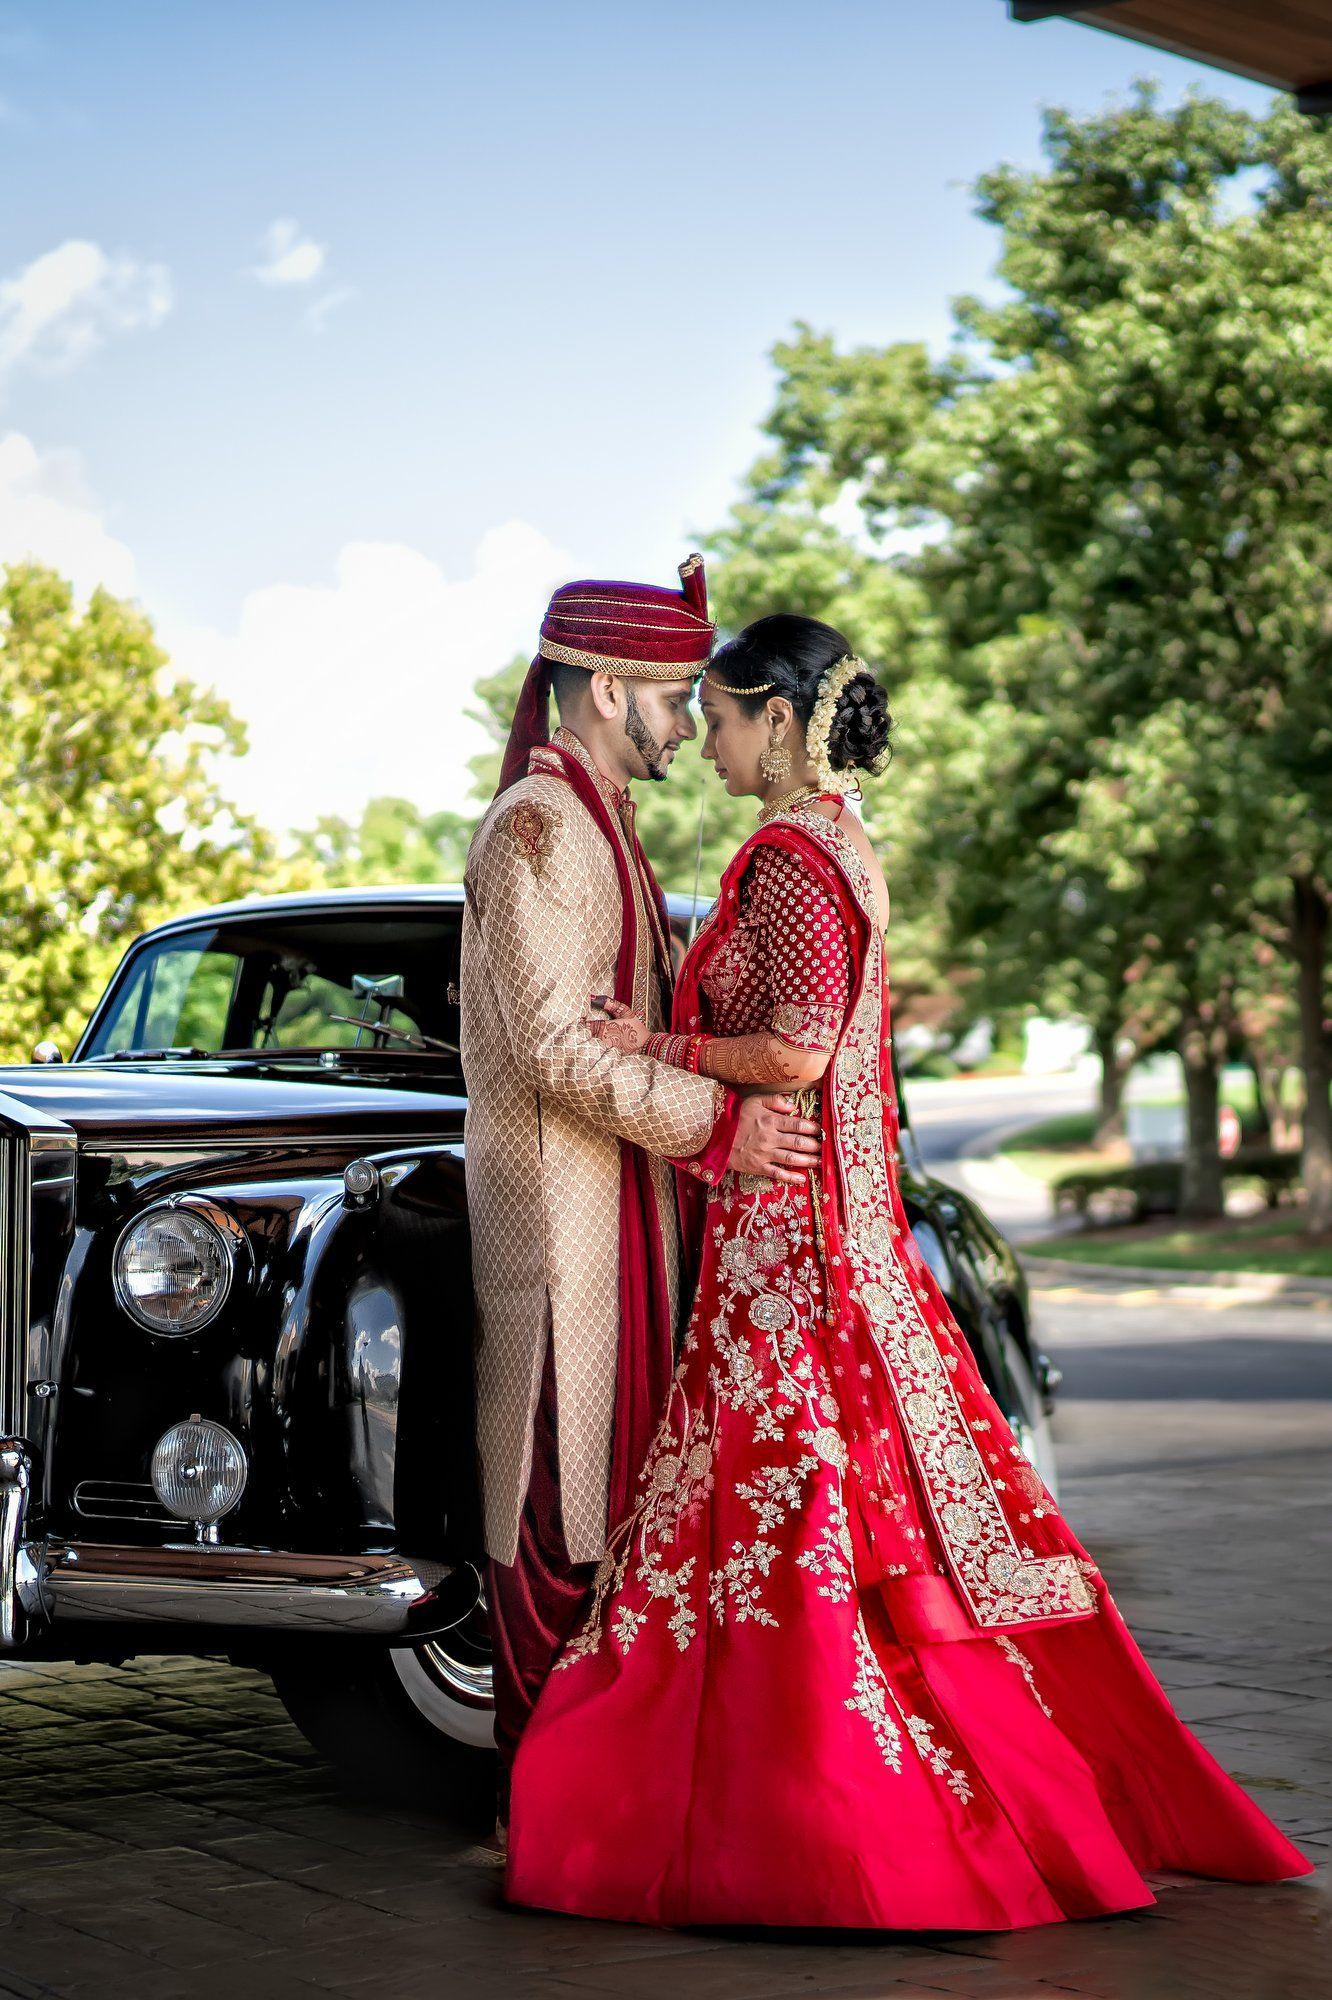 Romantic Indian Wedding Couple Shot - Bride in Interesting